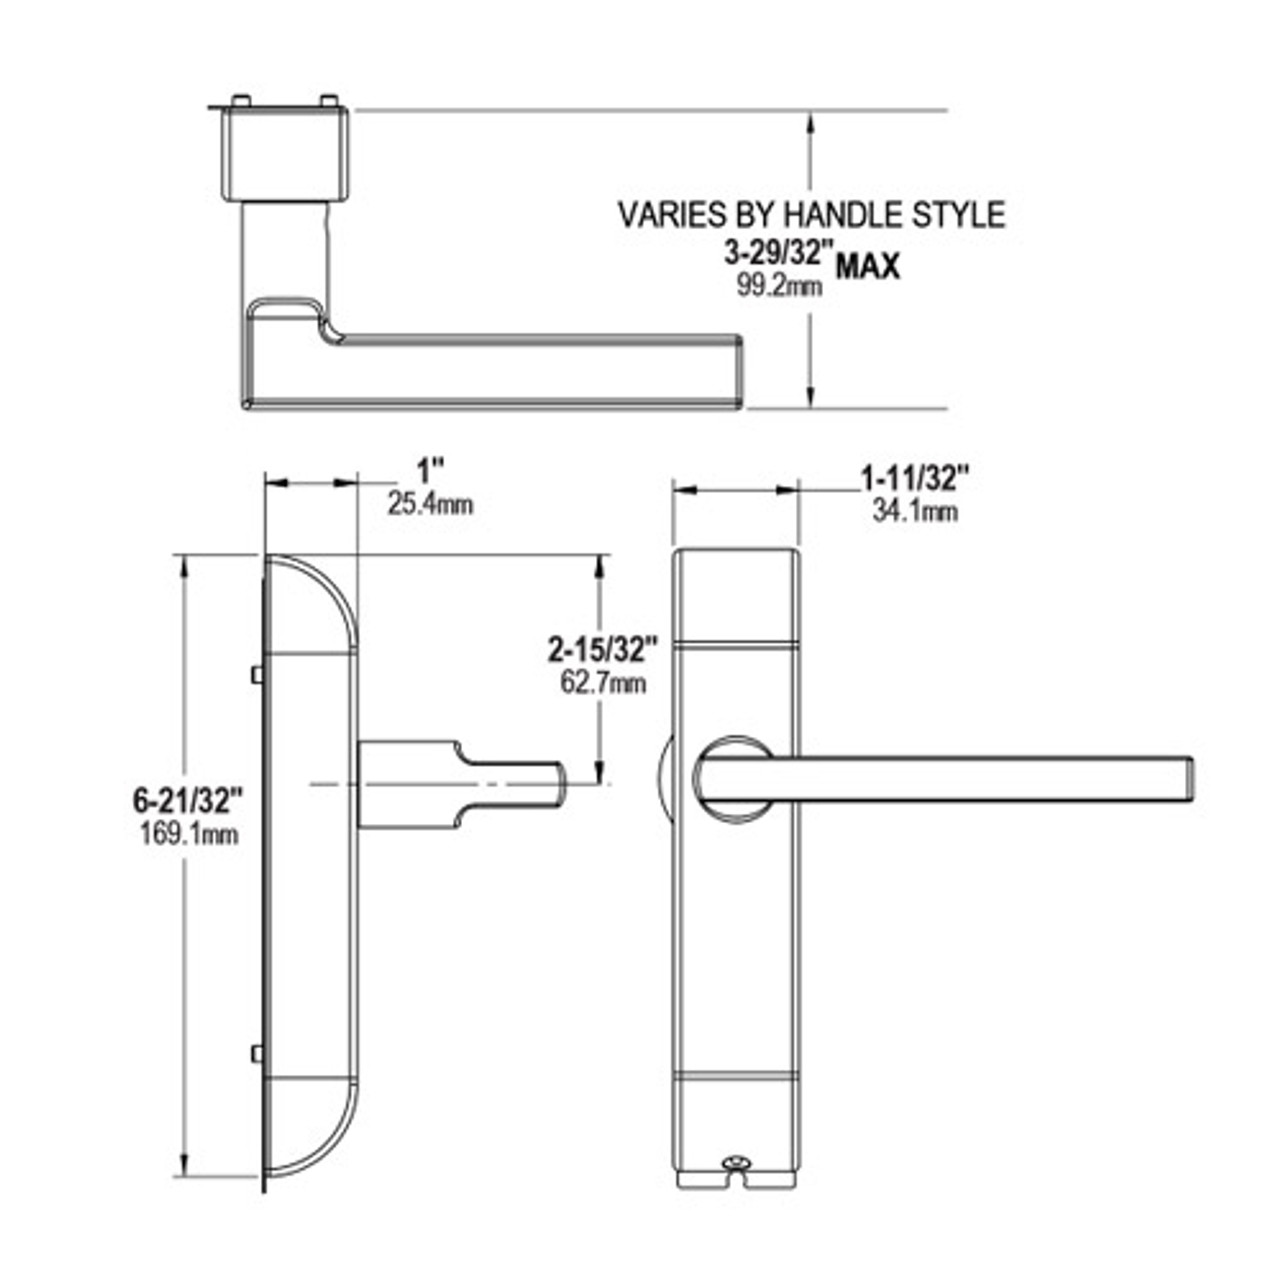 4600M-MD-651-US32 Adams Rite MD Designer handle Dimensional View